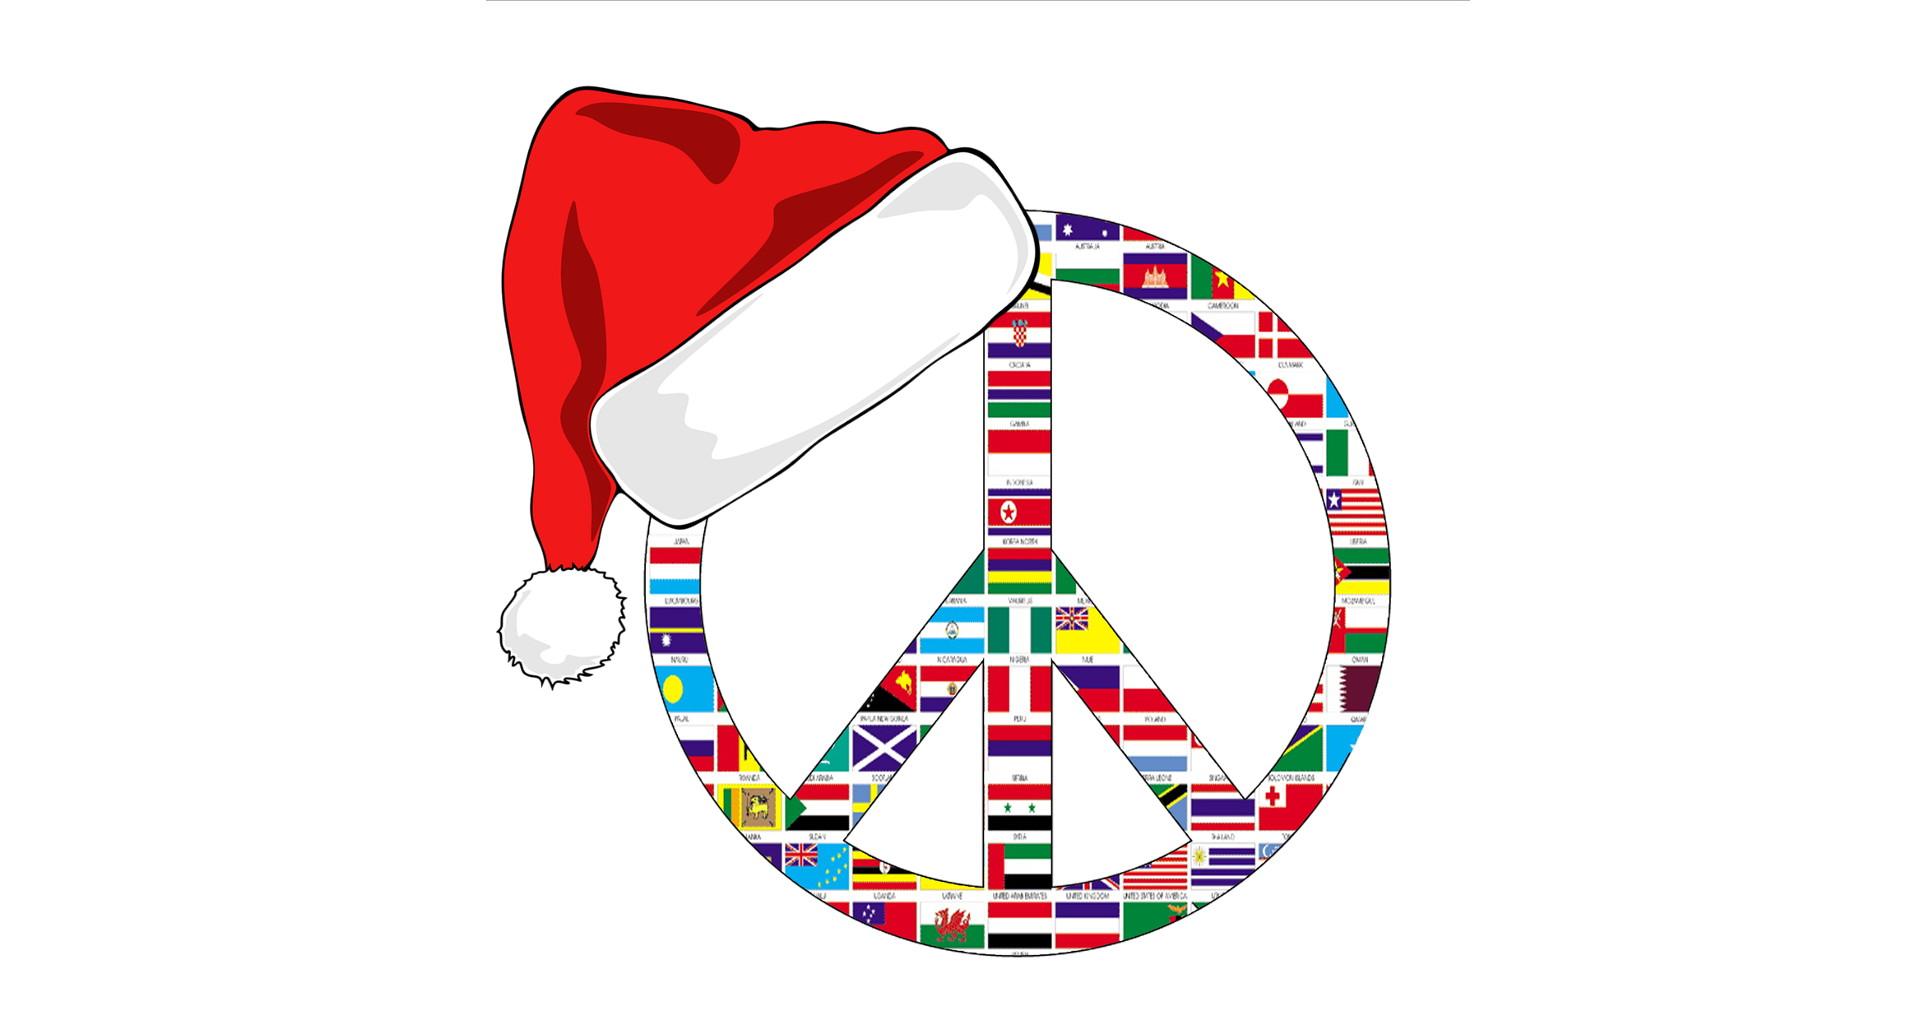 Peacemas - Internationaler Weihnachtsmarkt in Öhringen